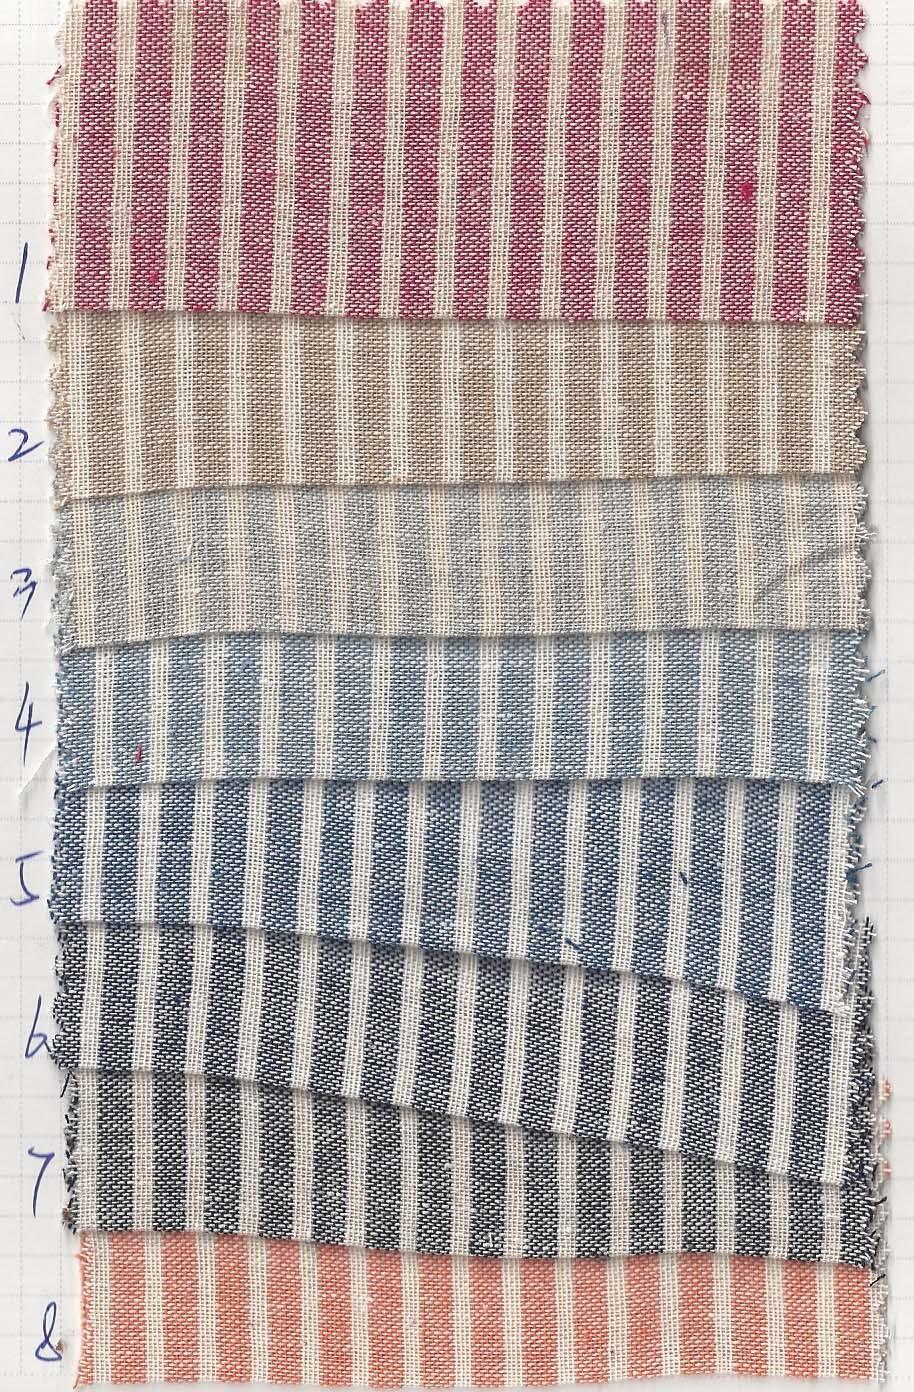 Sheng Ye Textile S425.jpg